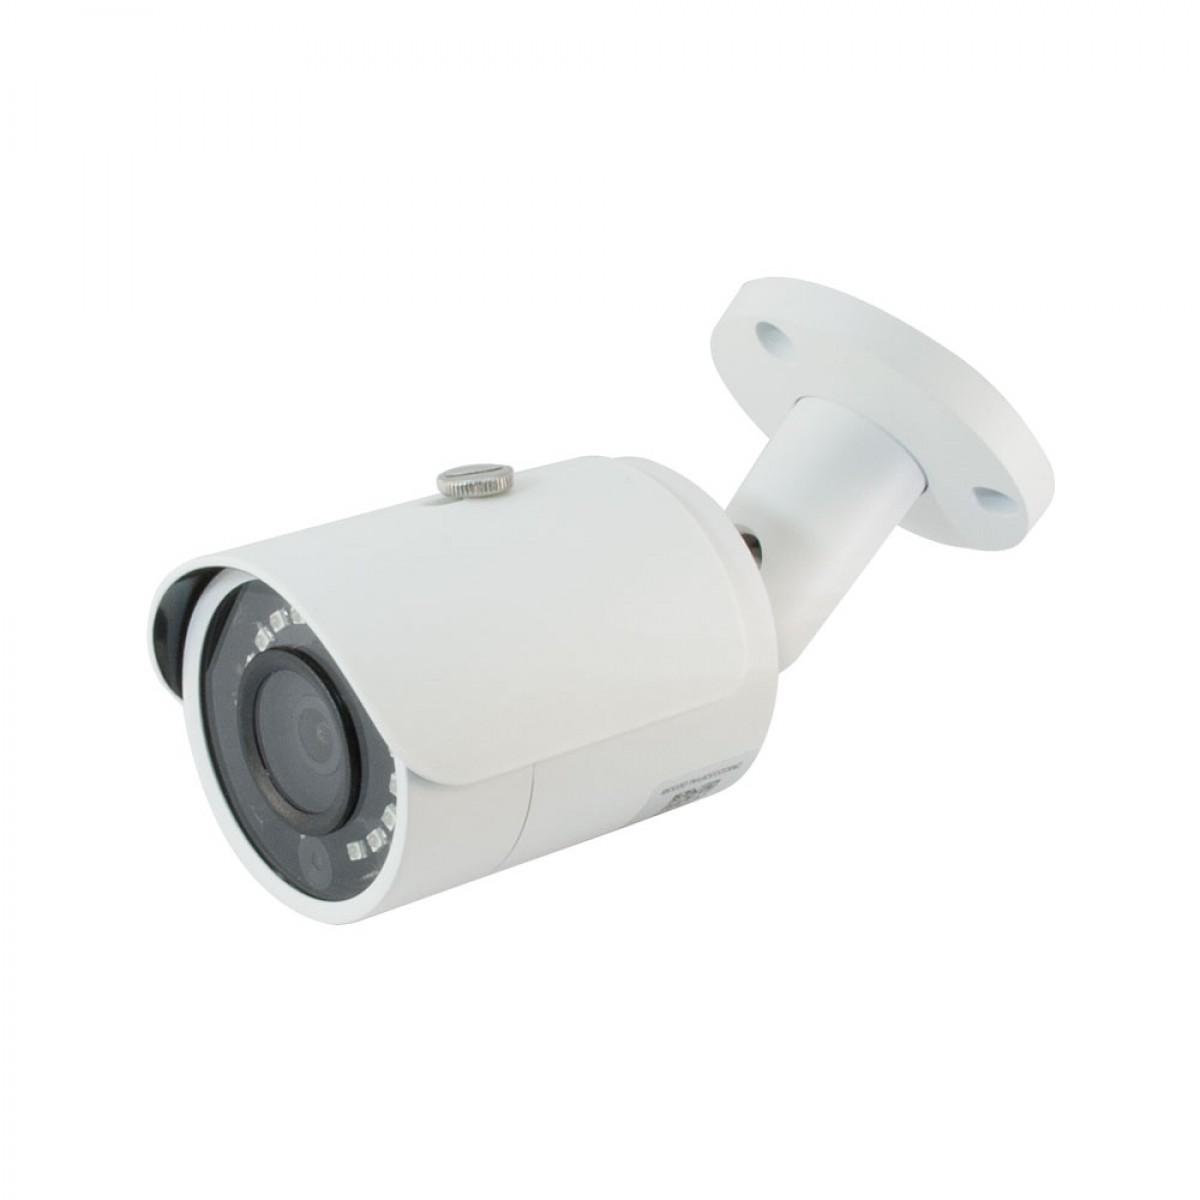 4mp H 264 Amp H 264 Full Hd Network Ir Bullet Camera 3 6mm